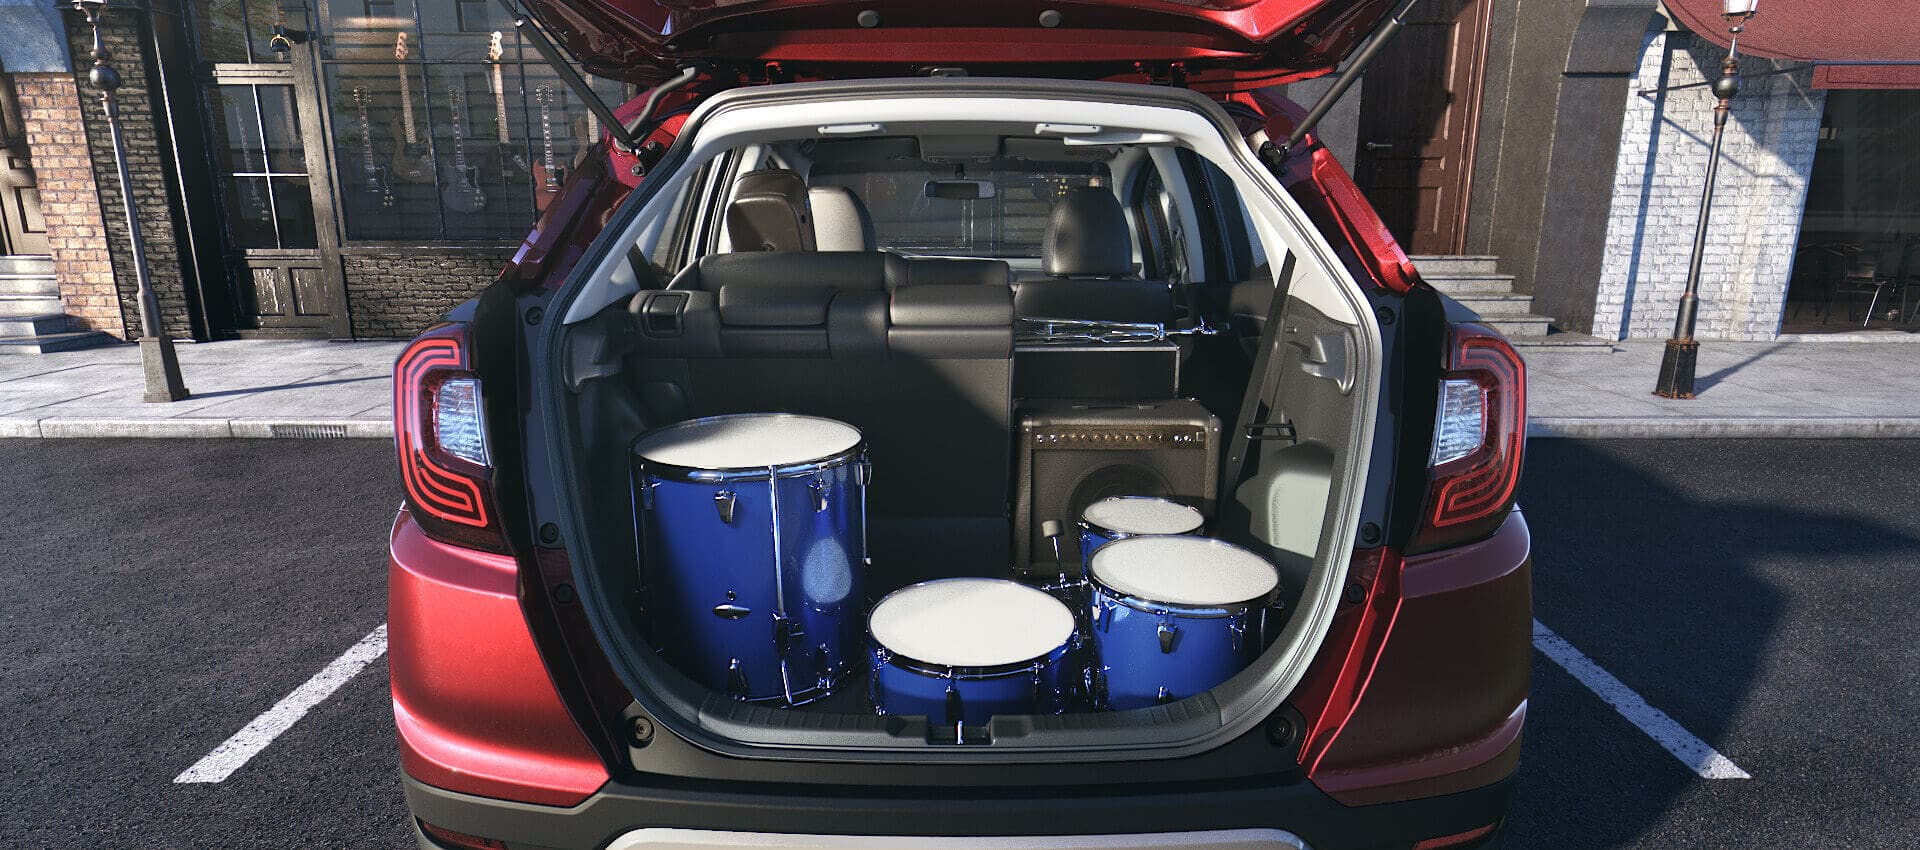 Honda WRV 2021: prijs, interieur, gegevensblad en verbruik